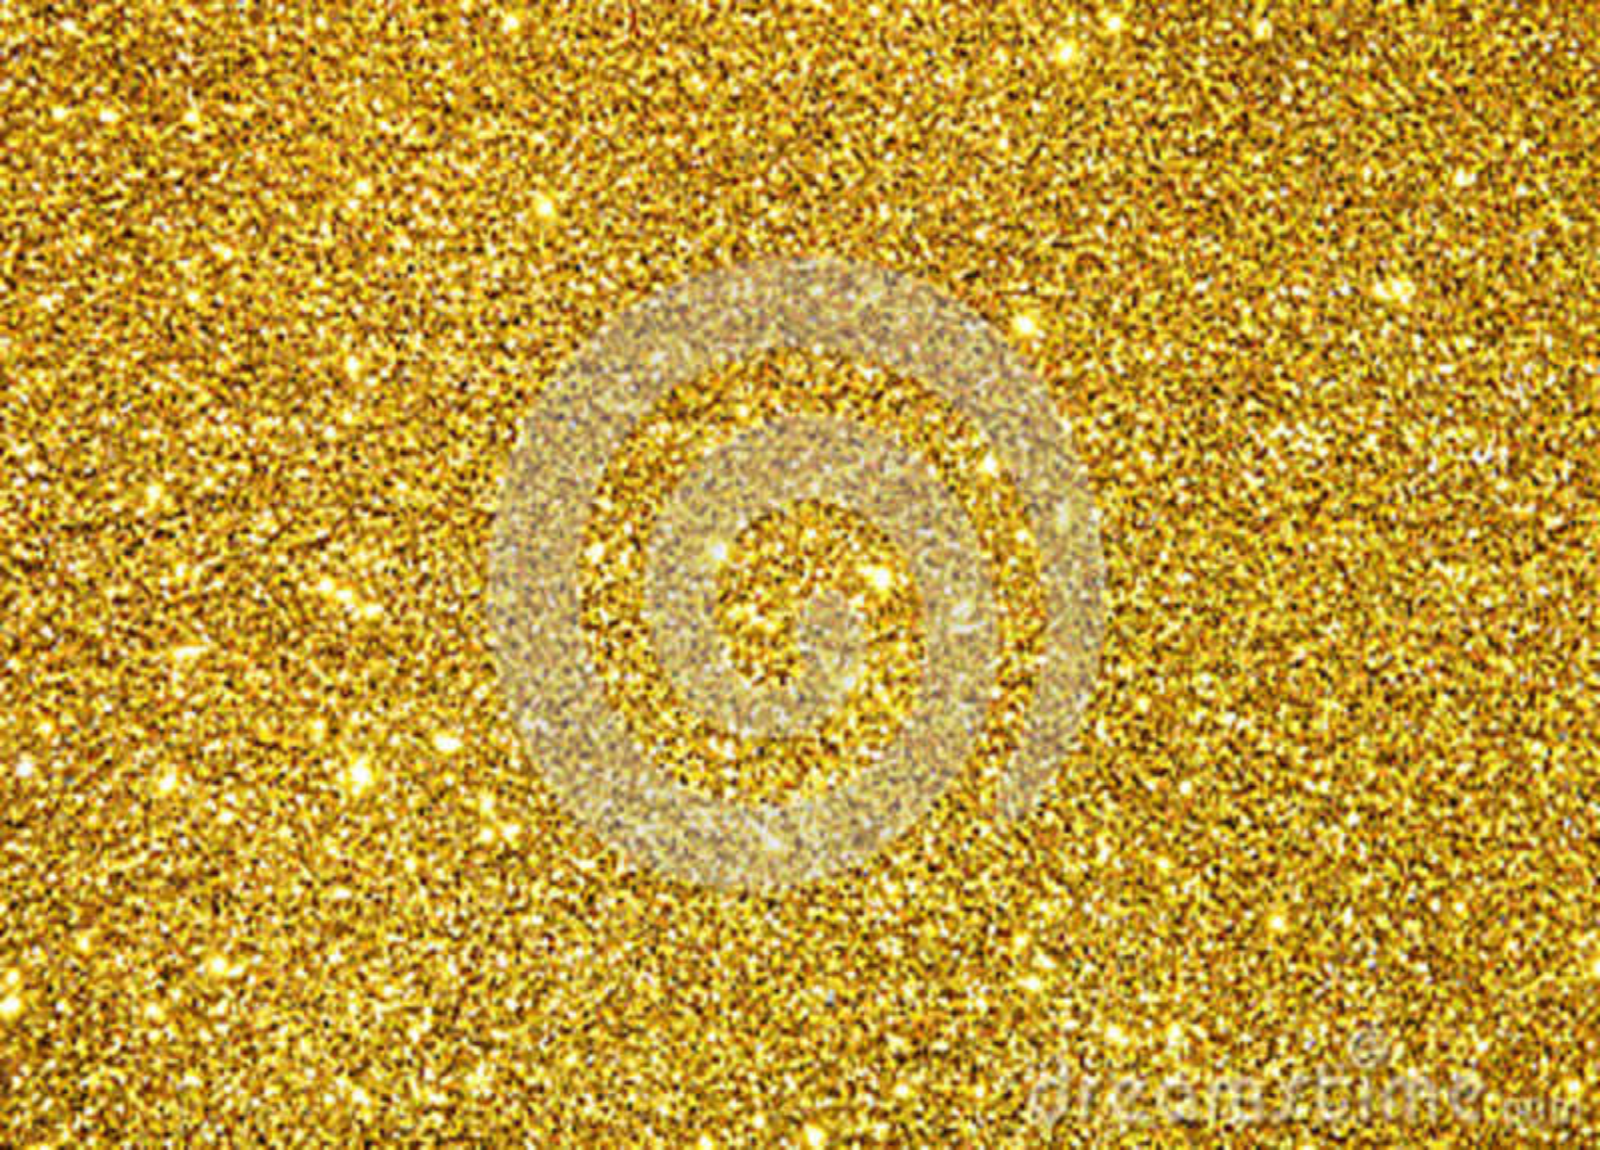 Festive gold sequins background